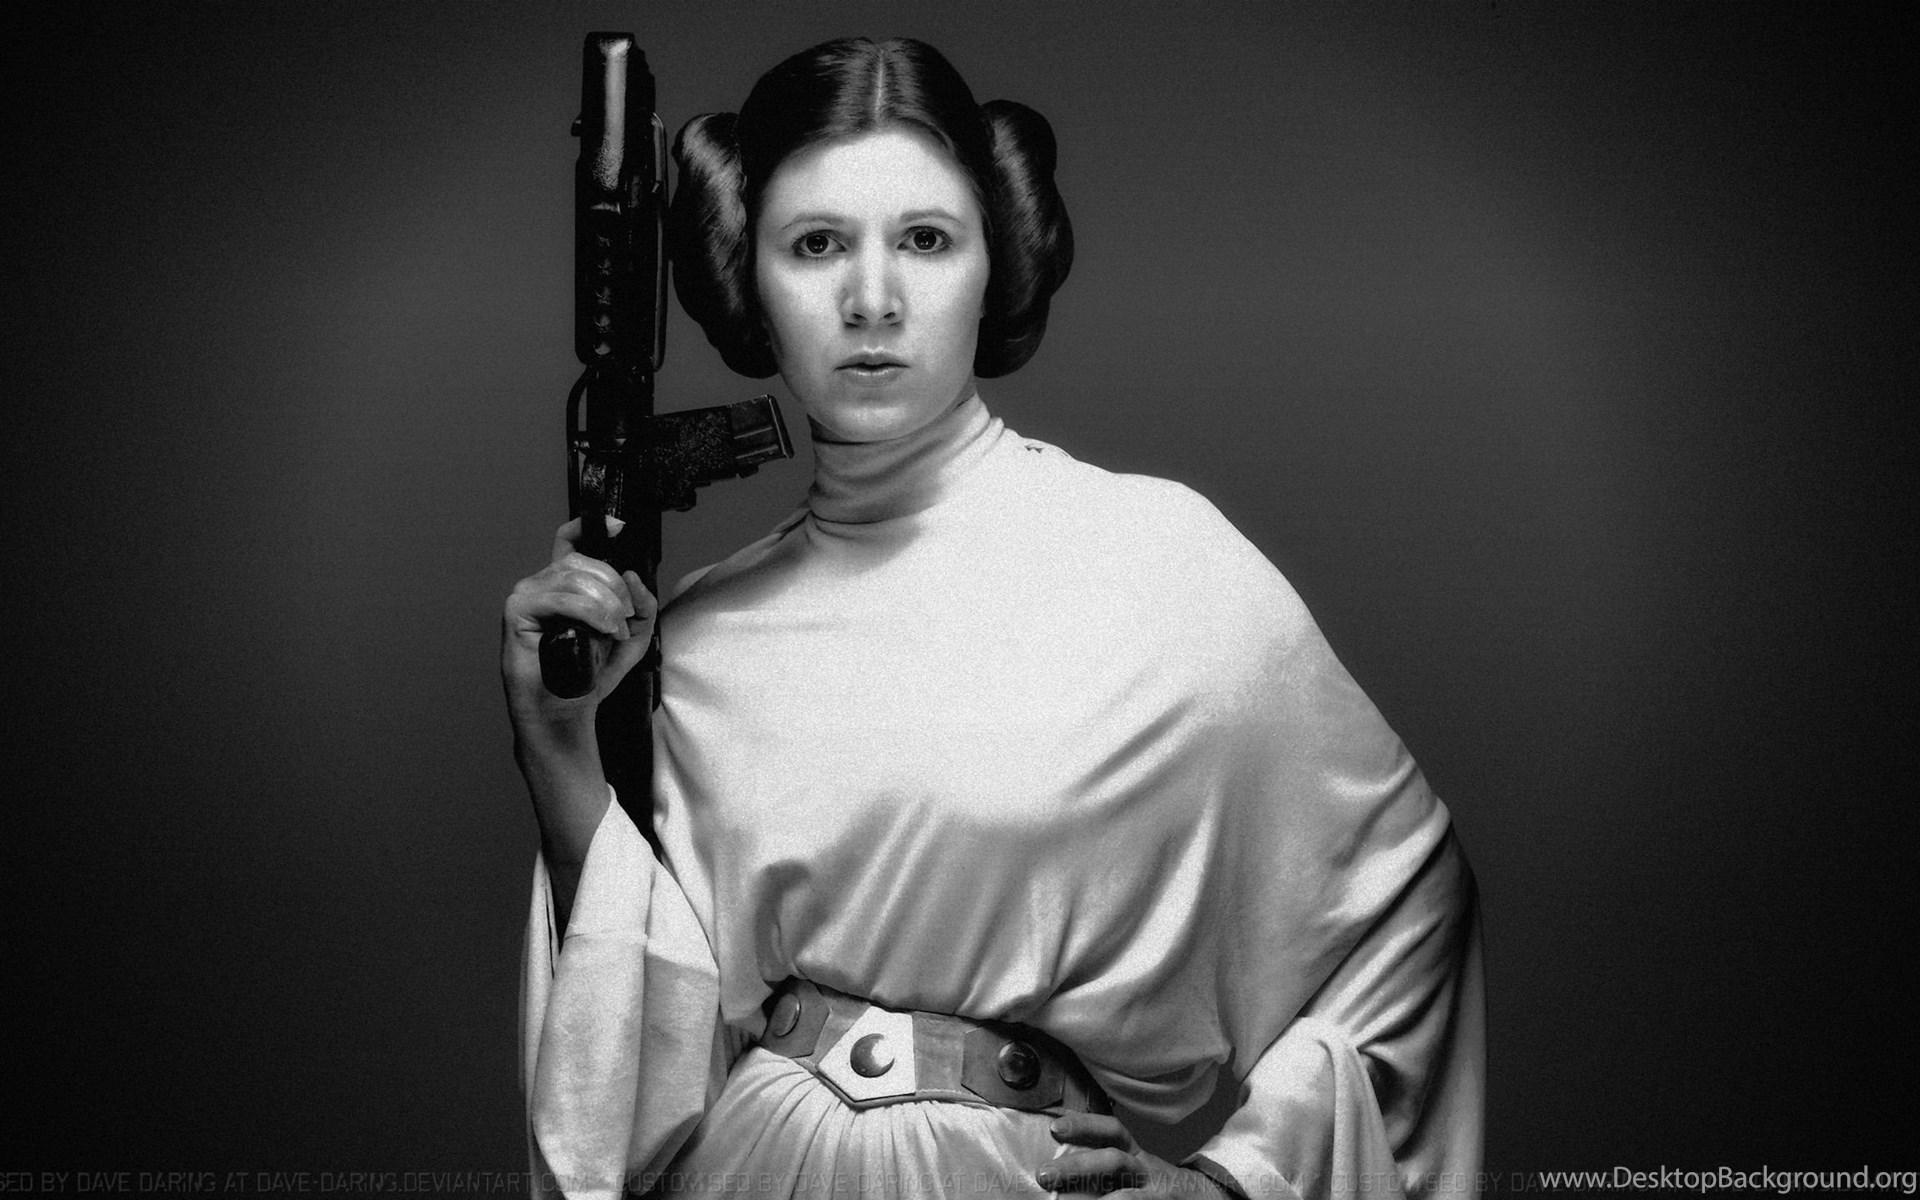 Carrie Fisher Princess Leia Xlvii V3 By Dave Daring On Deviantart Desktop Background